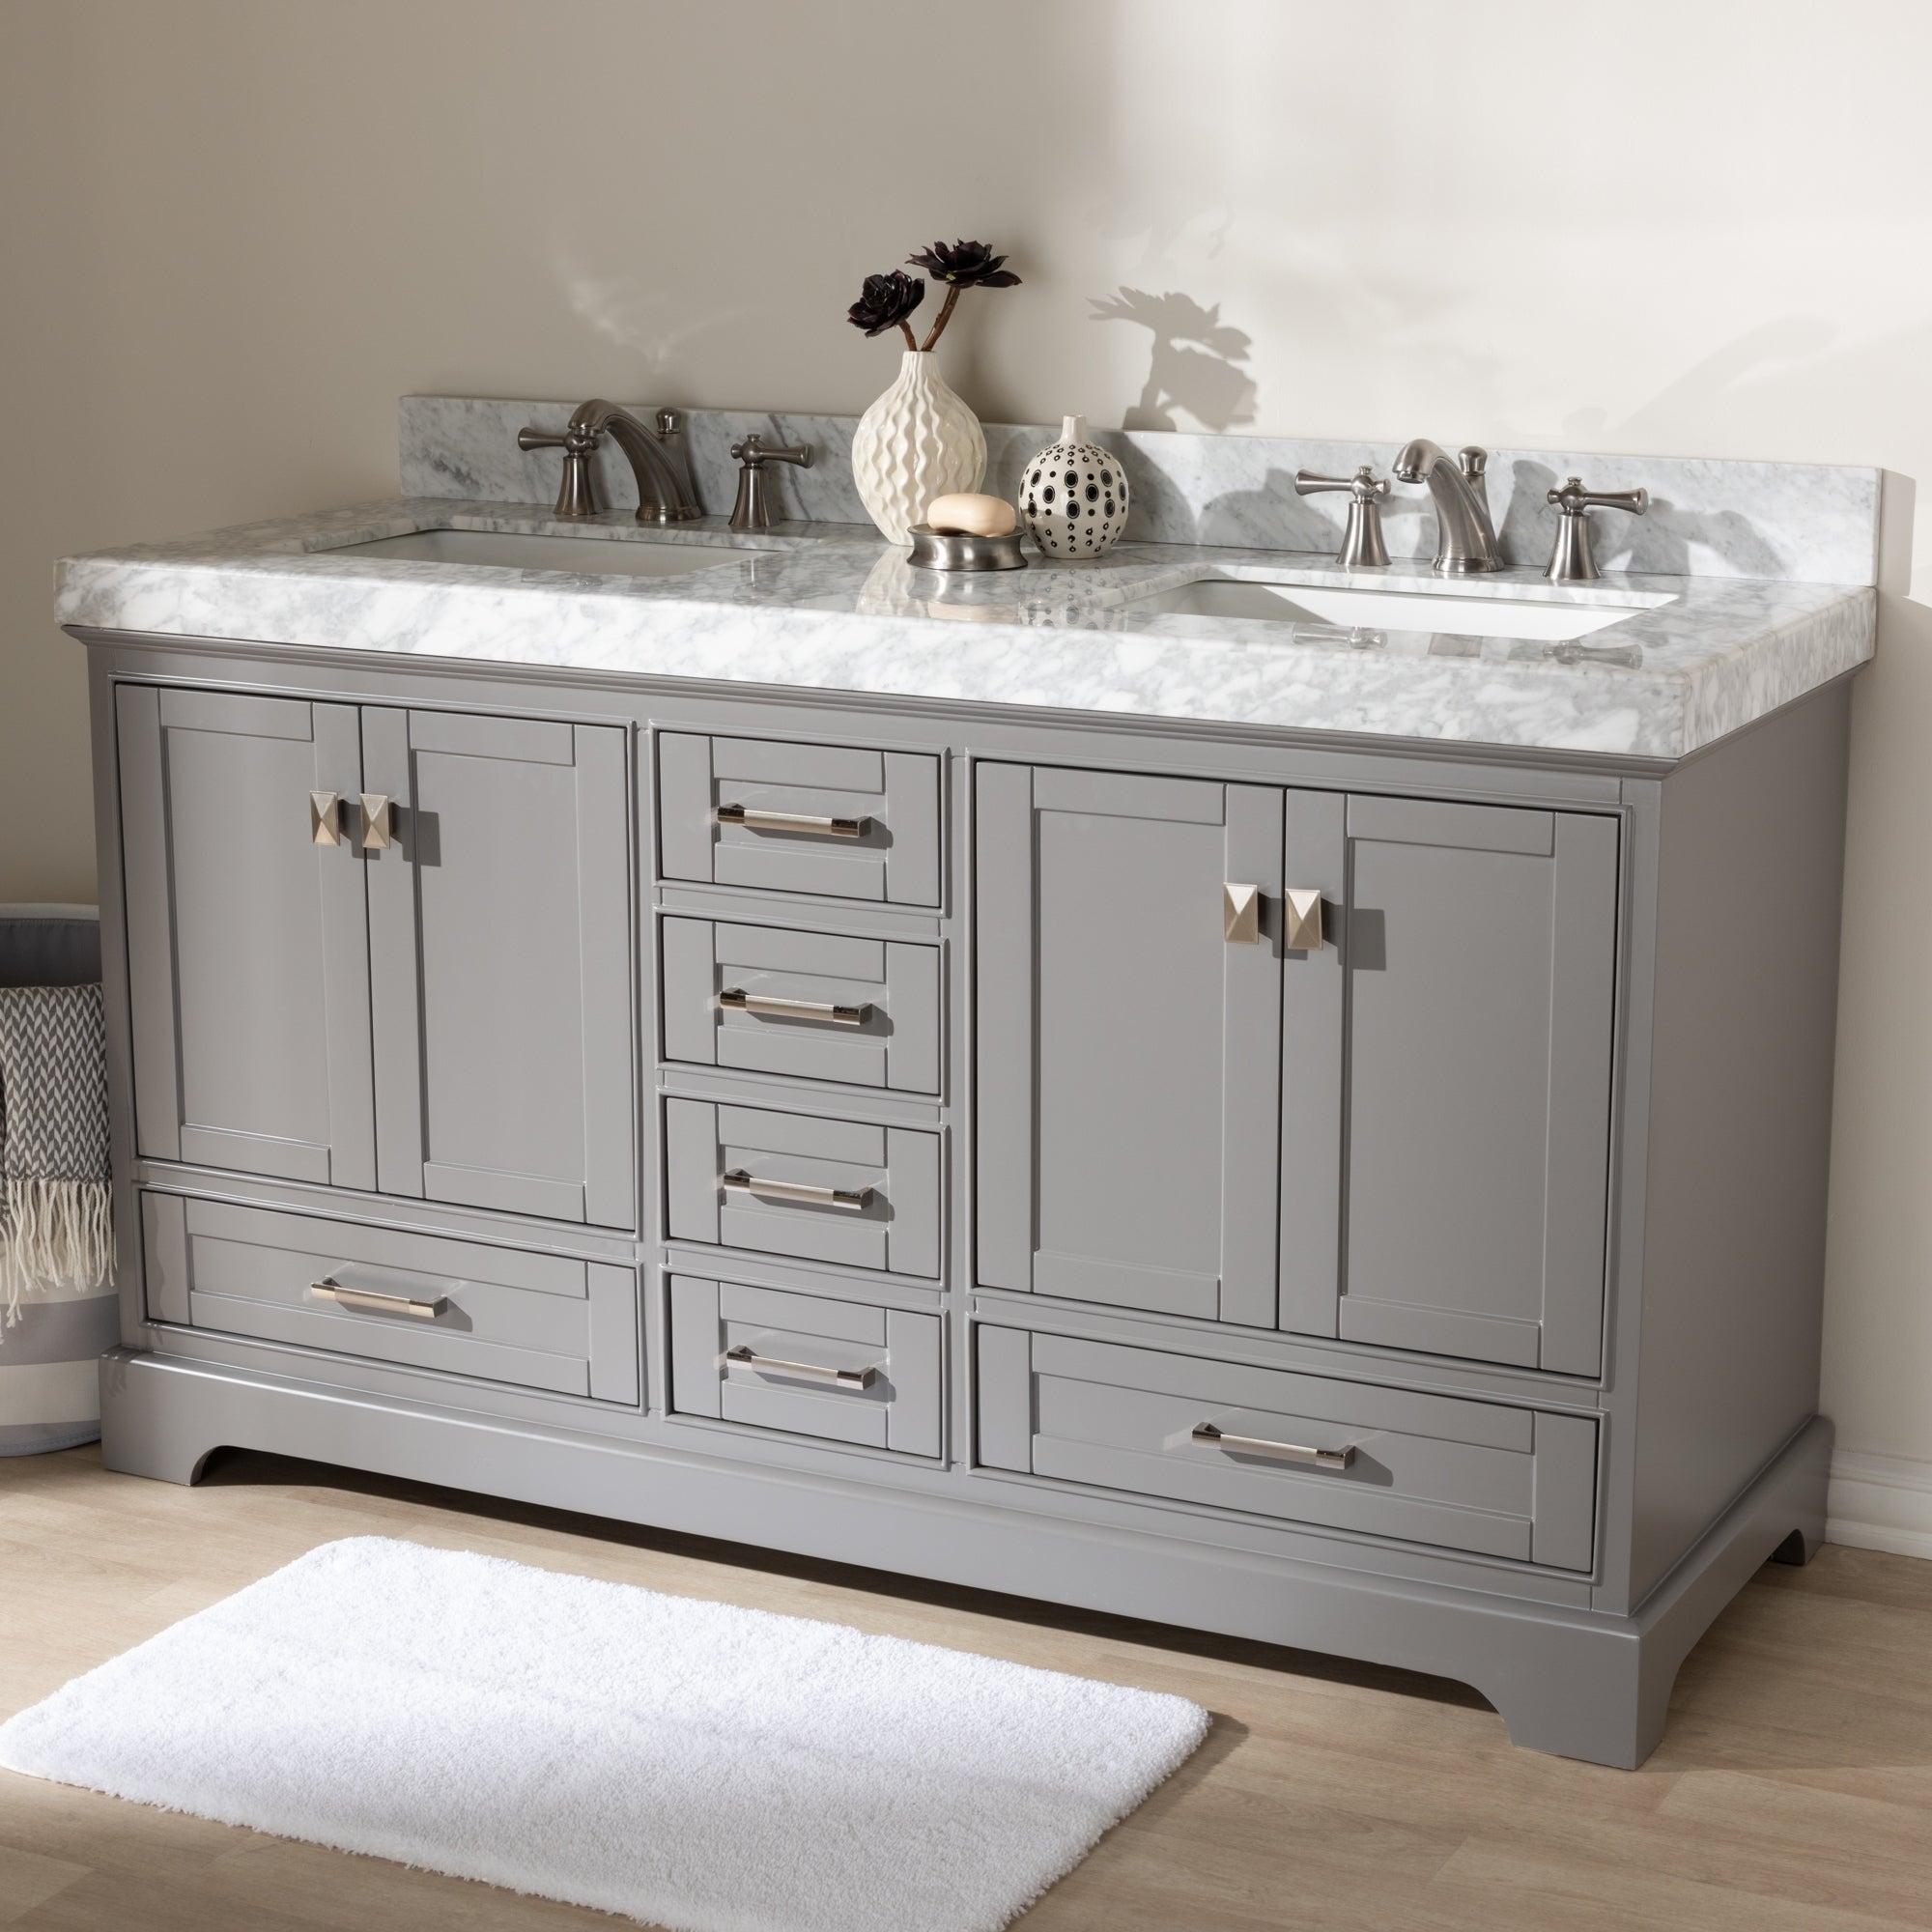 Shop 60 Inch Double Sink Bathroom Vanity By Baxton Studio